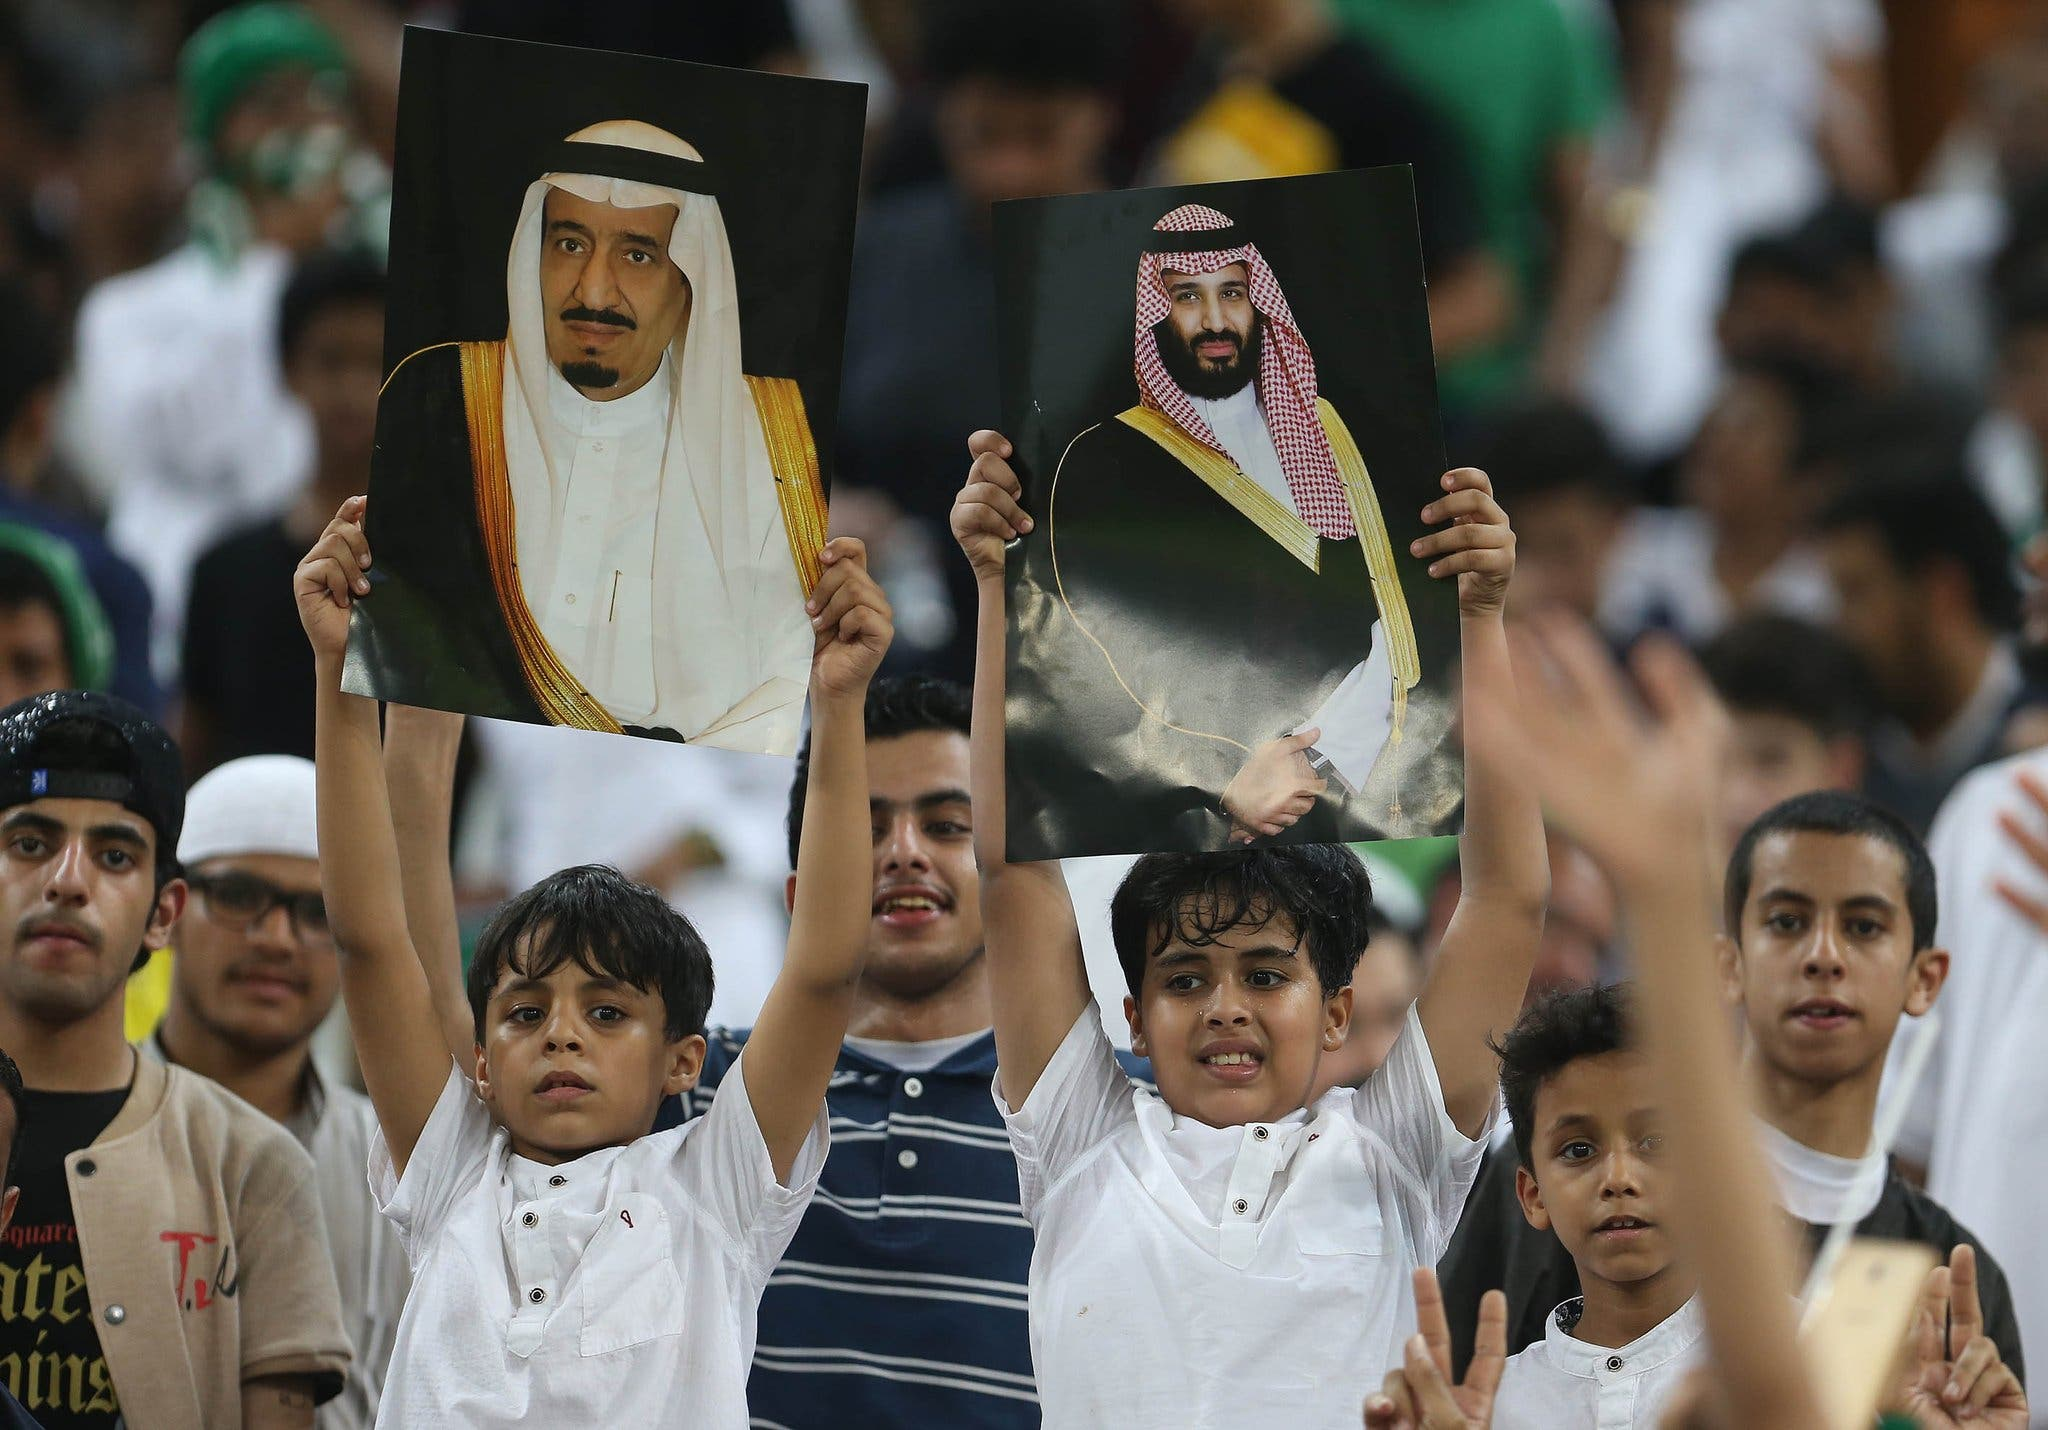 Saudi Arabia's fans hold up portraits of Saudi King Salman and Crown Prince Mohammed bin Salman during the FIFA World Cup 2018 qualification football match between Saudi and Japan at King Abdullah bin Abdulaziz Stadium in Jeddah on September 5, 2017. (AFP)